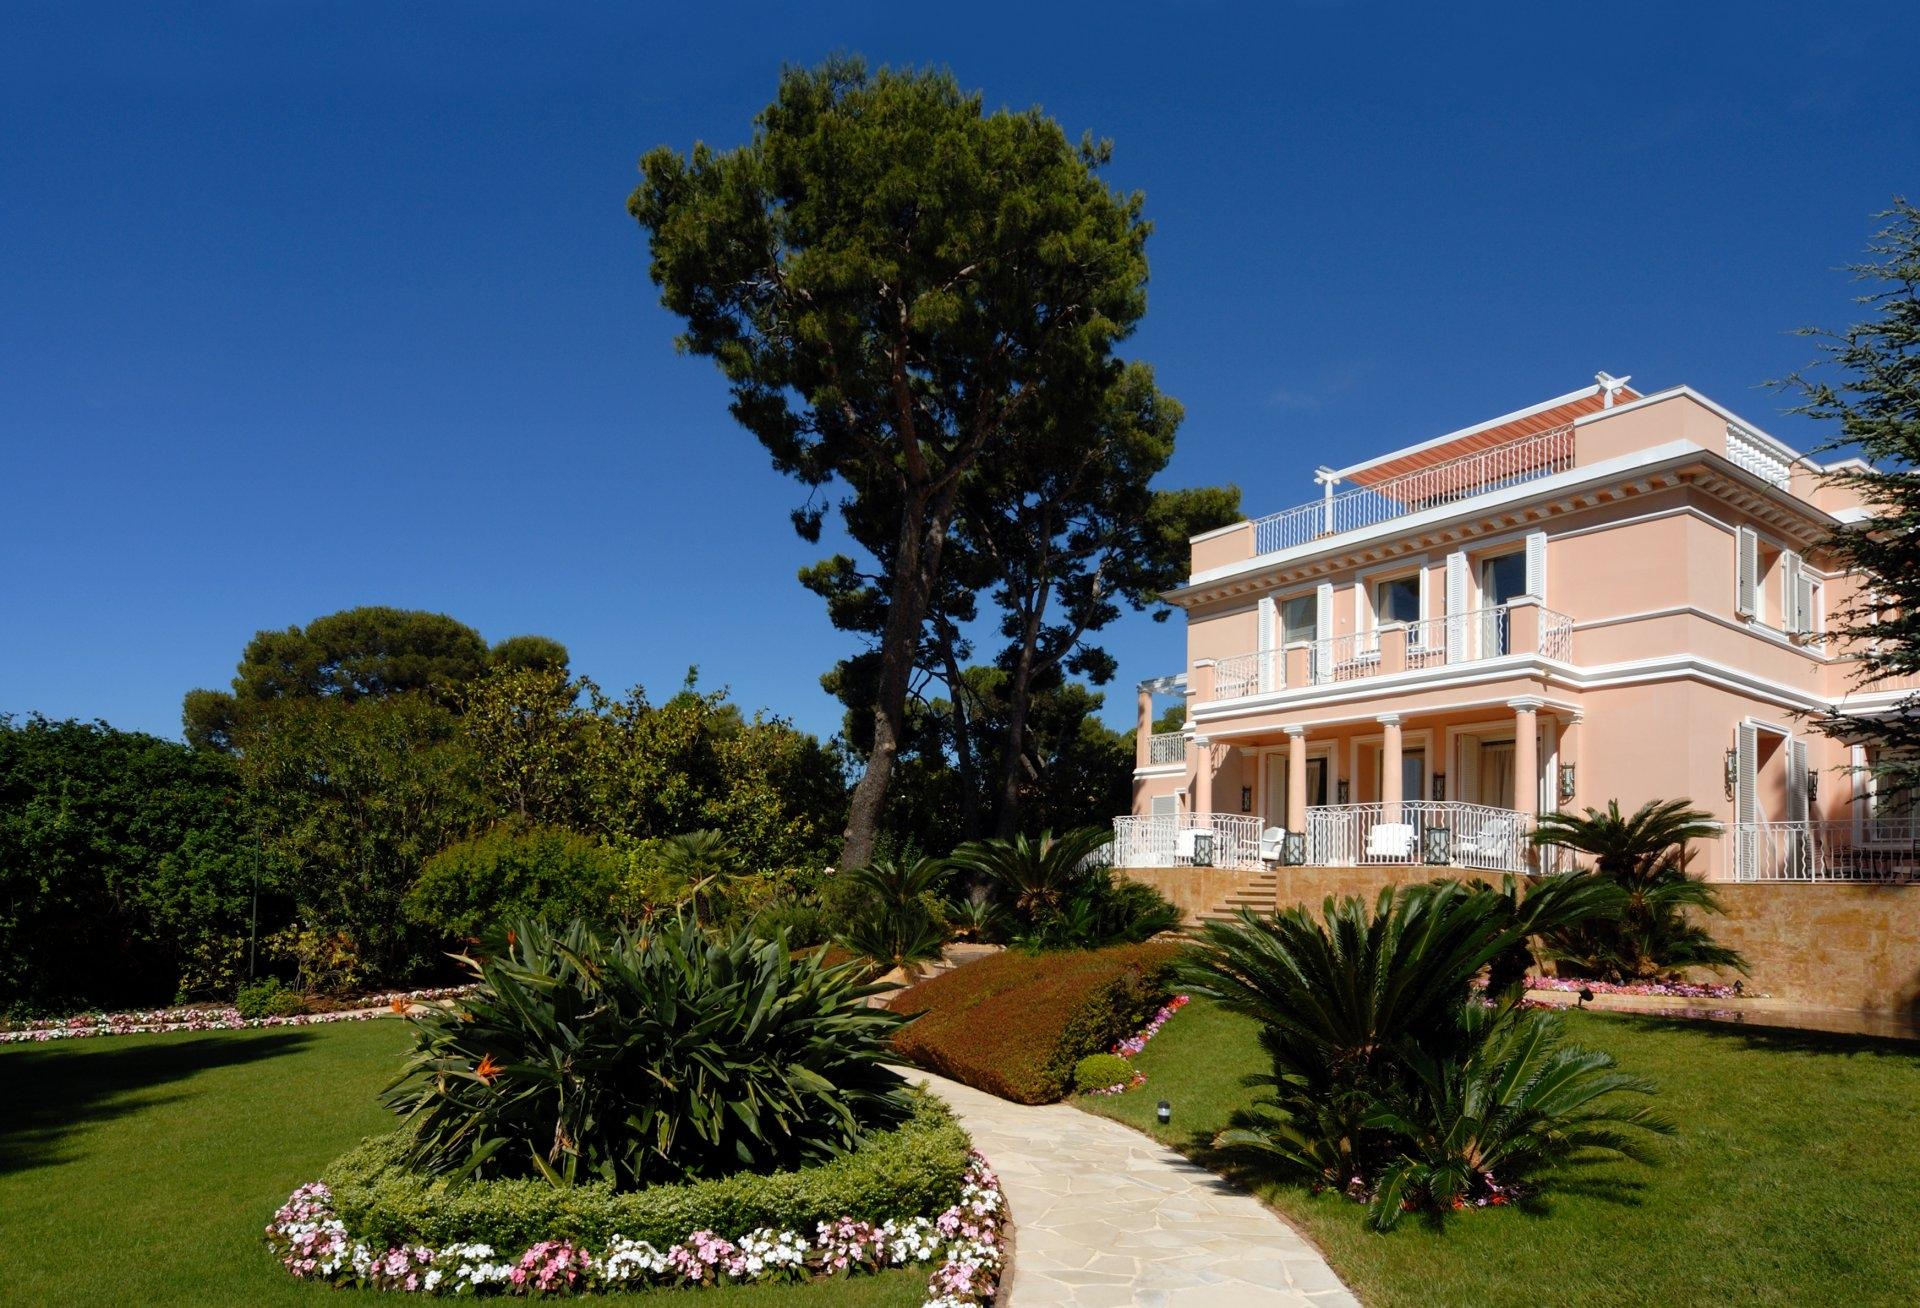 Luxury Villa for rent at Saint Jean Cap Ferrat | Dotta